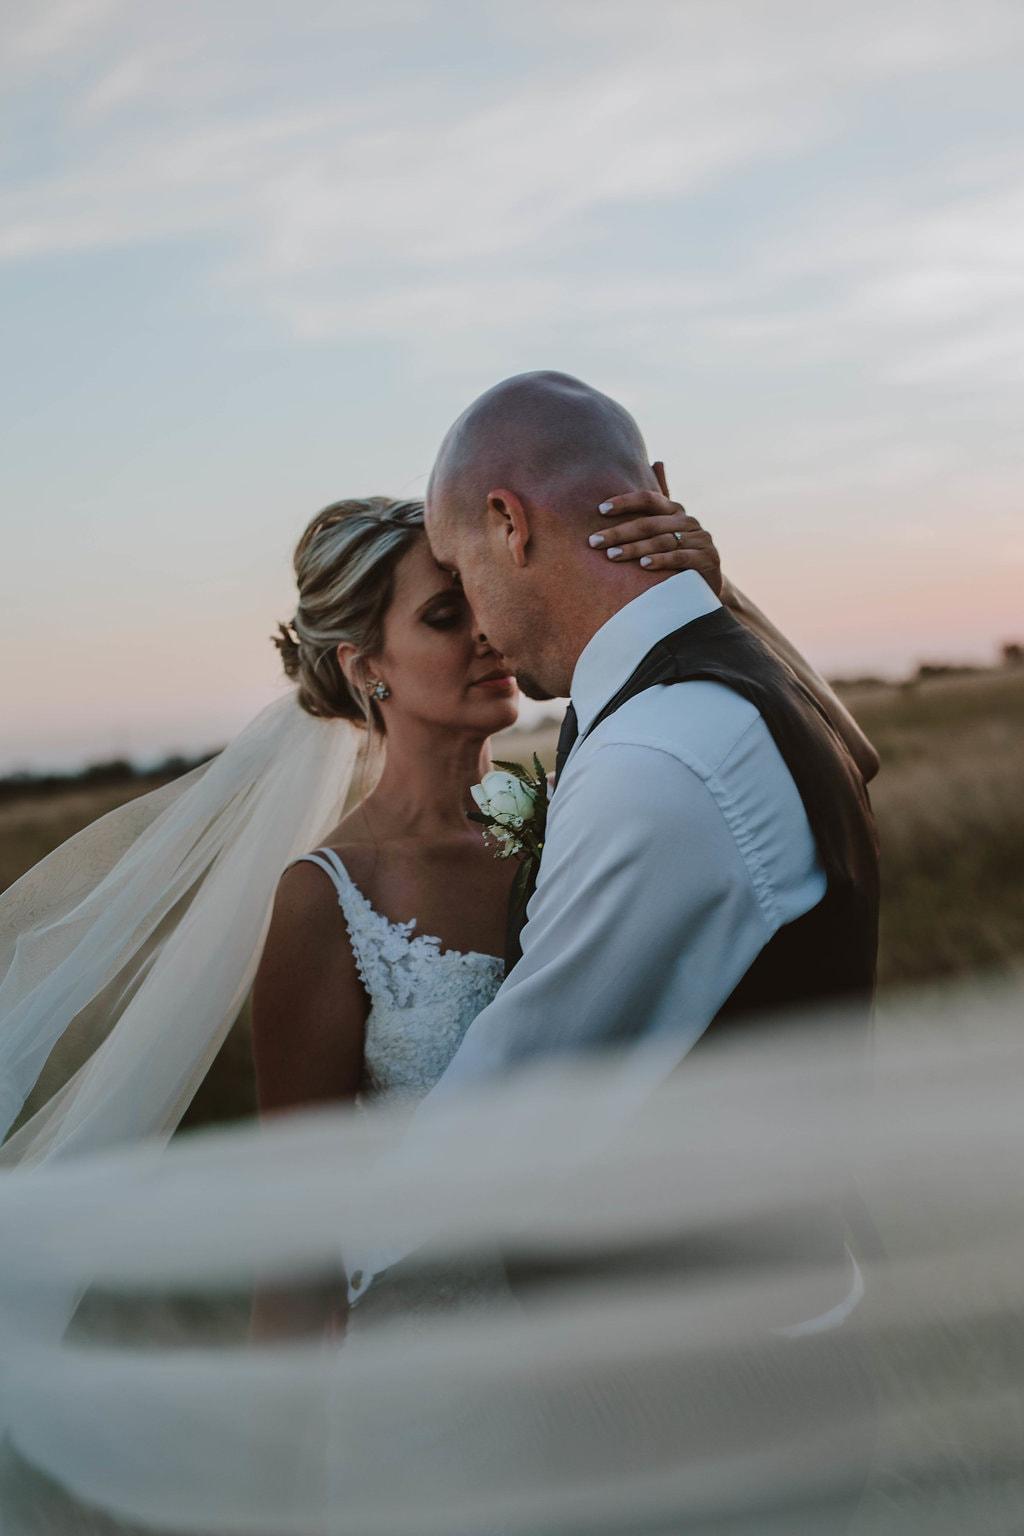 Couple Portrait | Image: Jessica J Photography